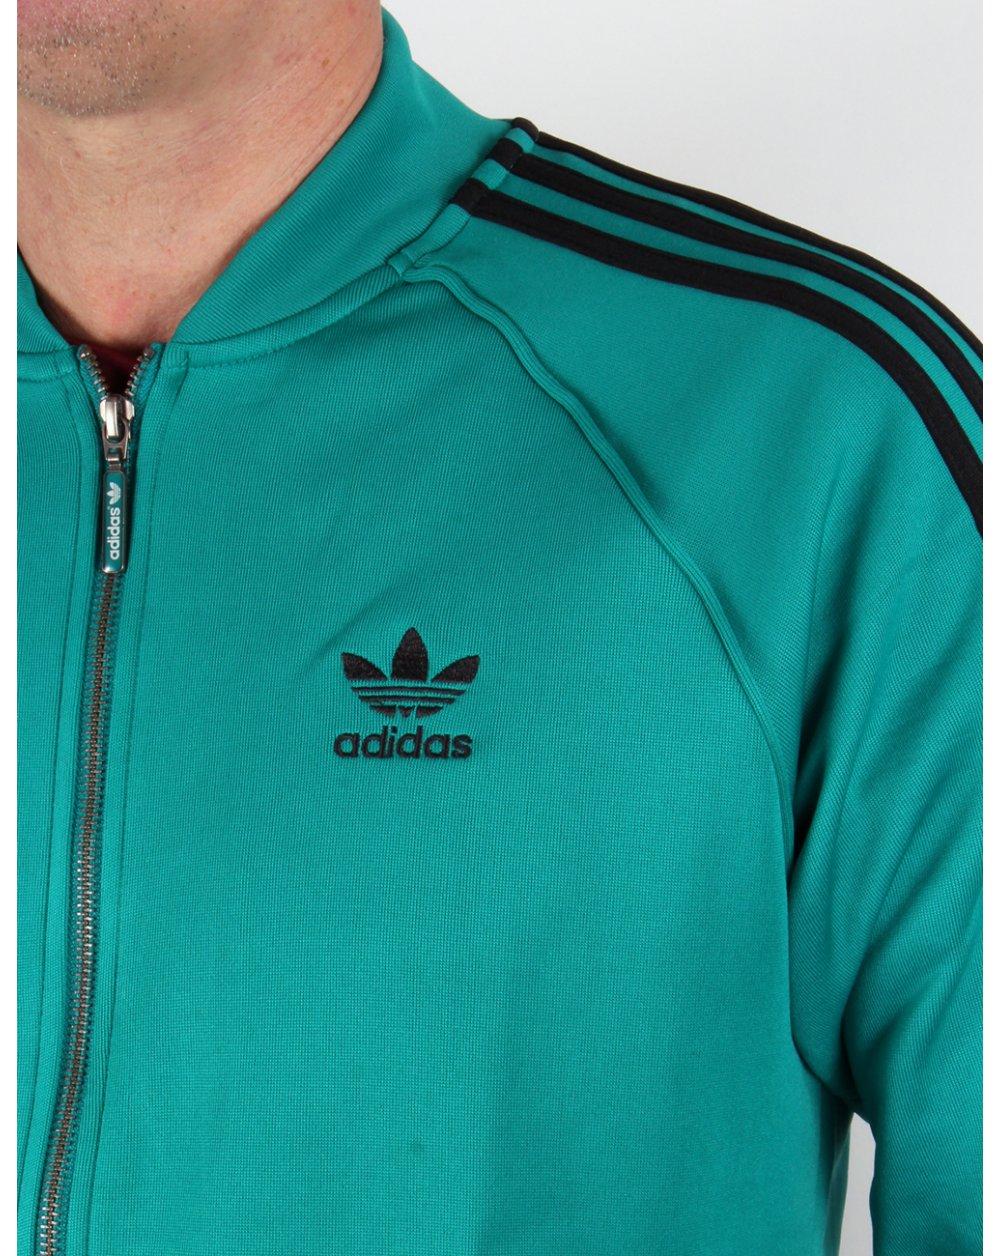 Adidas Originaler Super Jakke Grønn FMIkhsX